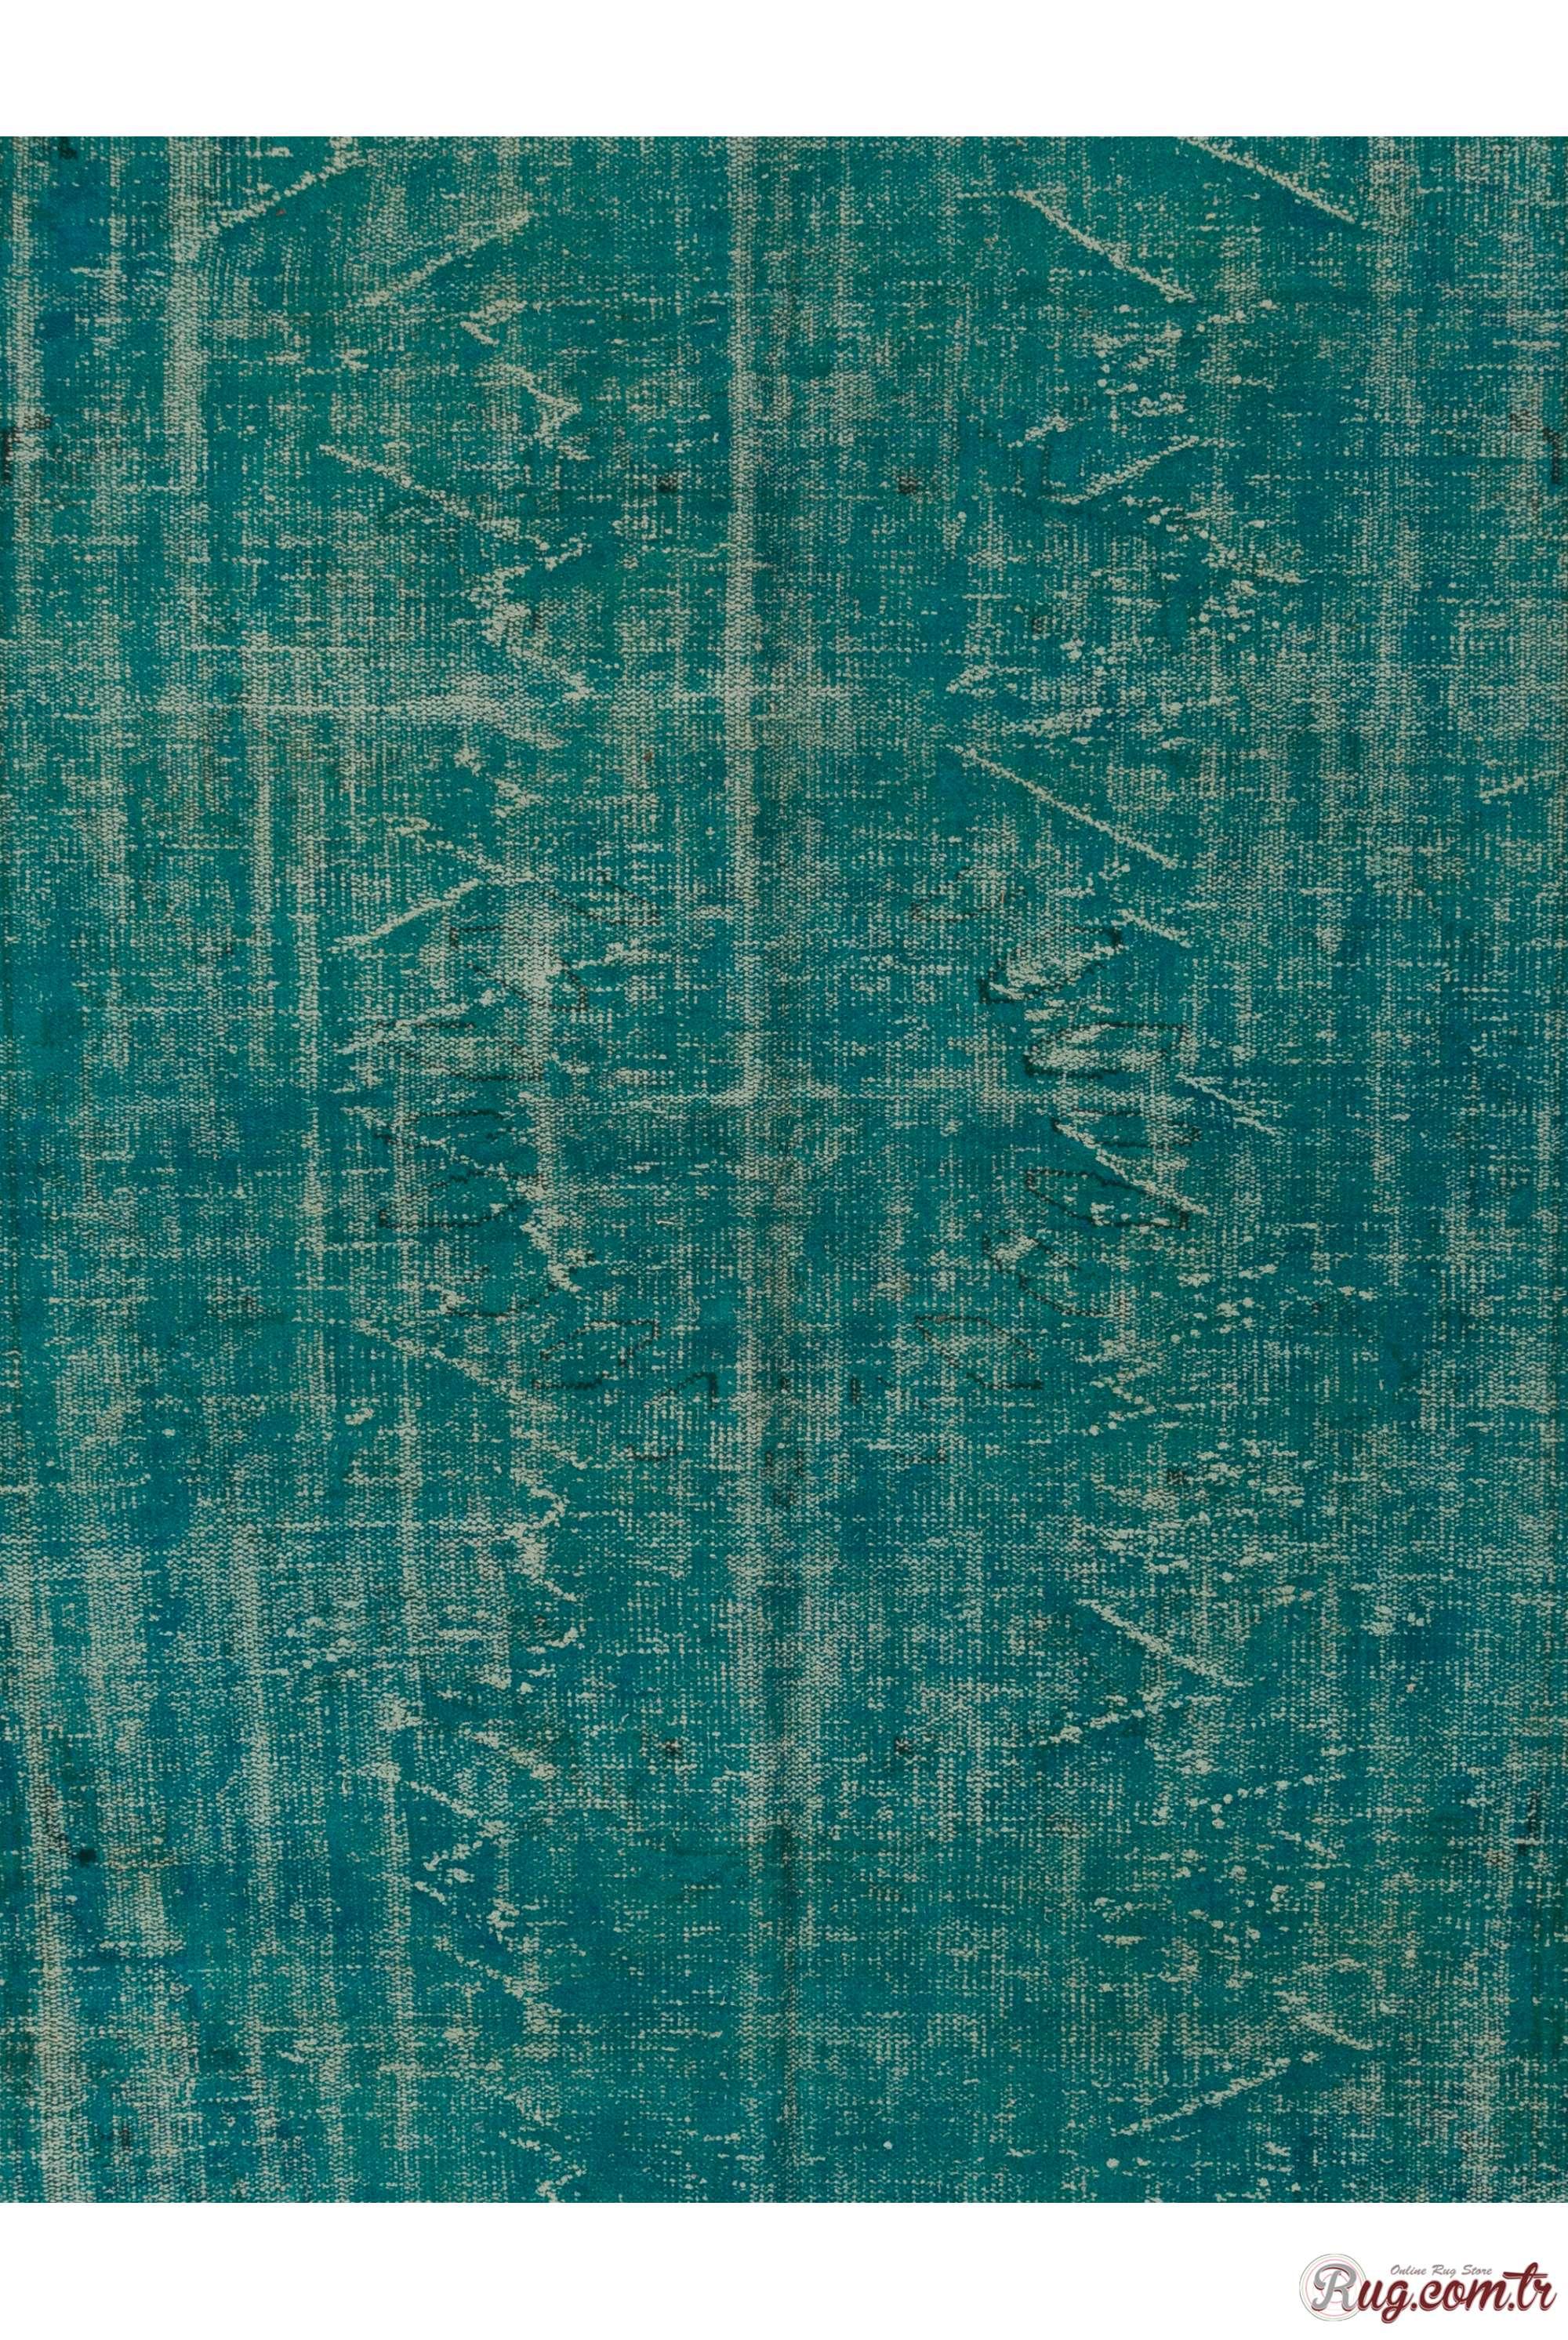 Turquoise Blue Color Vintage Overdyed Handmade Turkish Rug